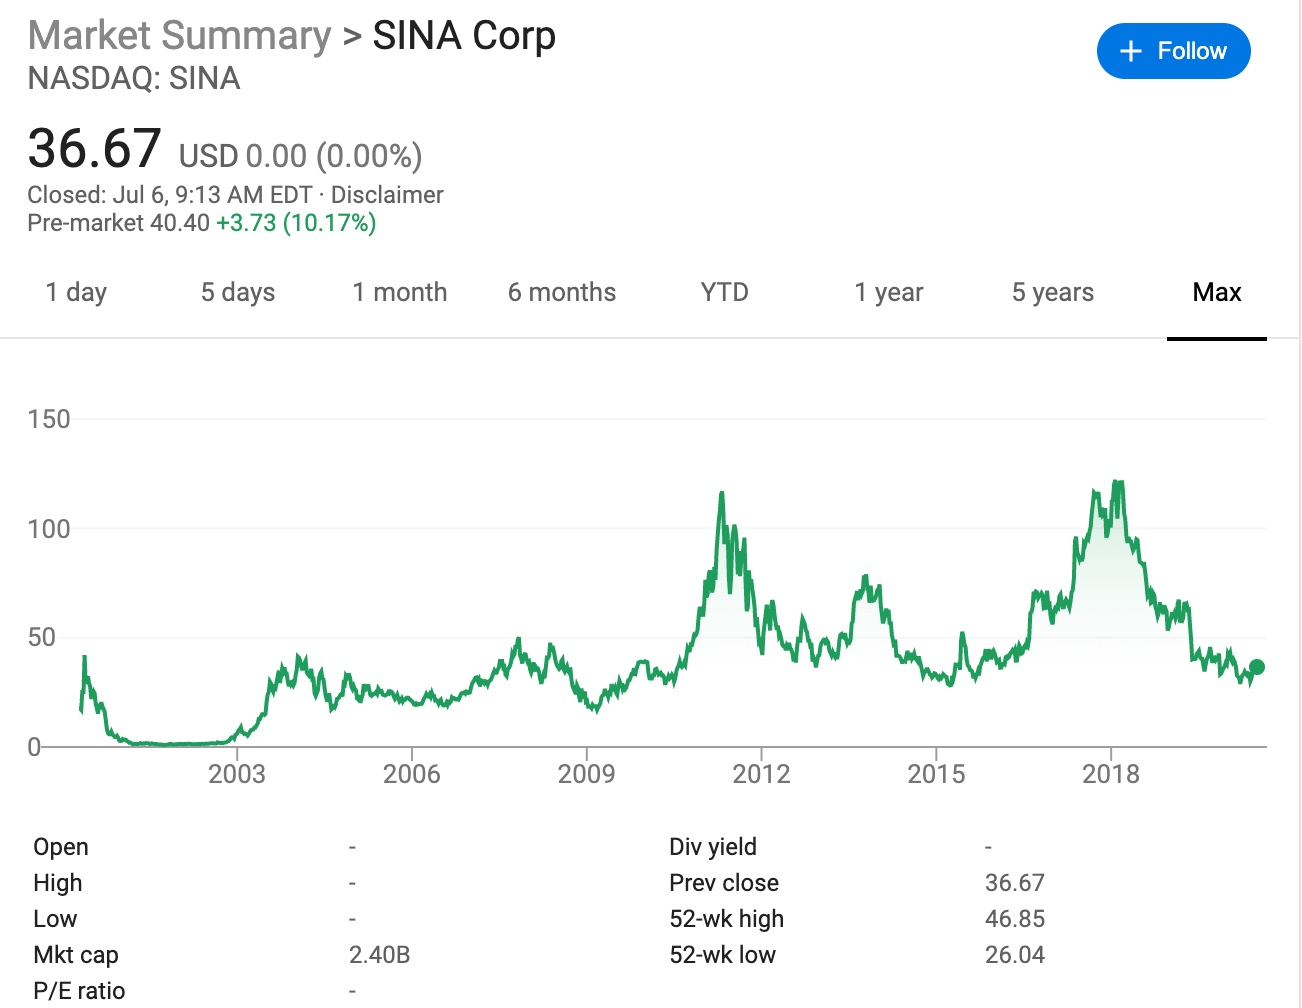 Sina shares surge 10 percent pre-market after receiving 'privatization' offer-CnTechPost